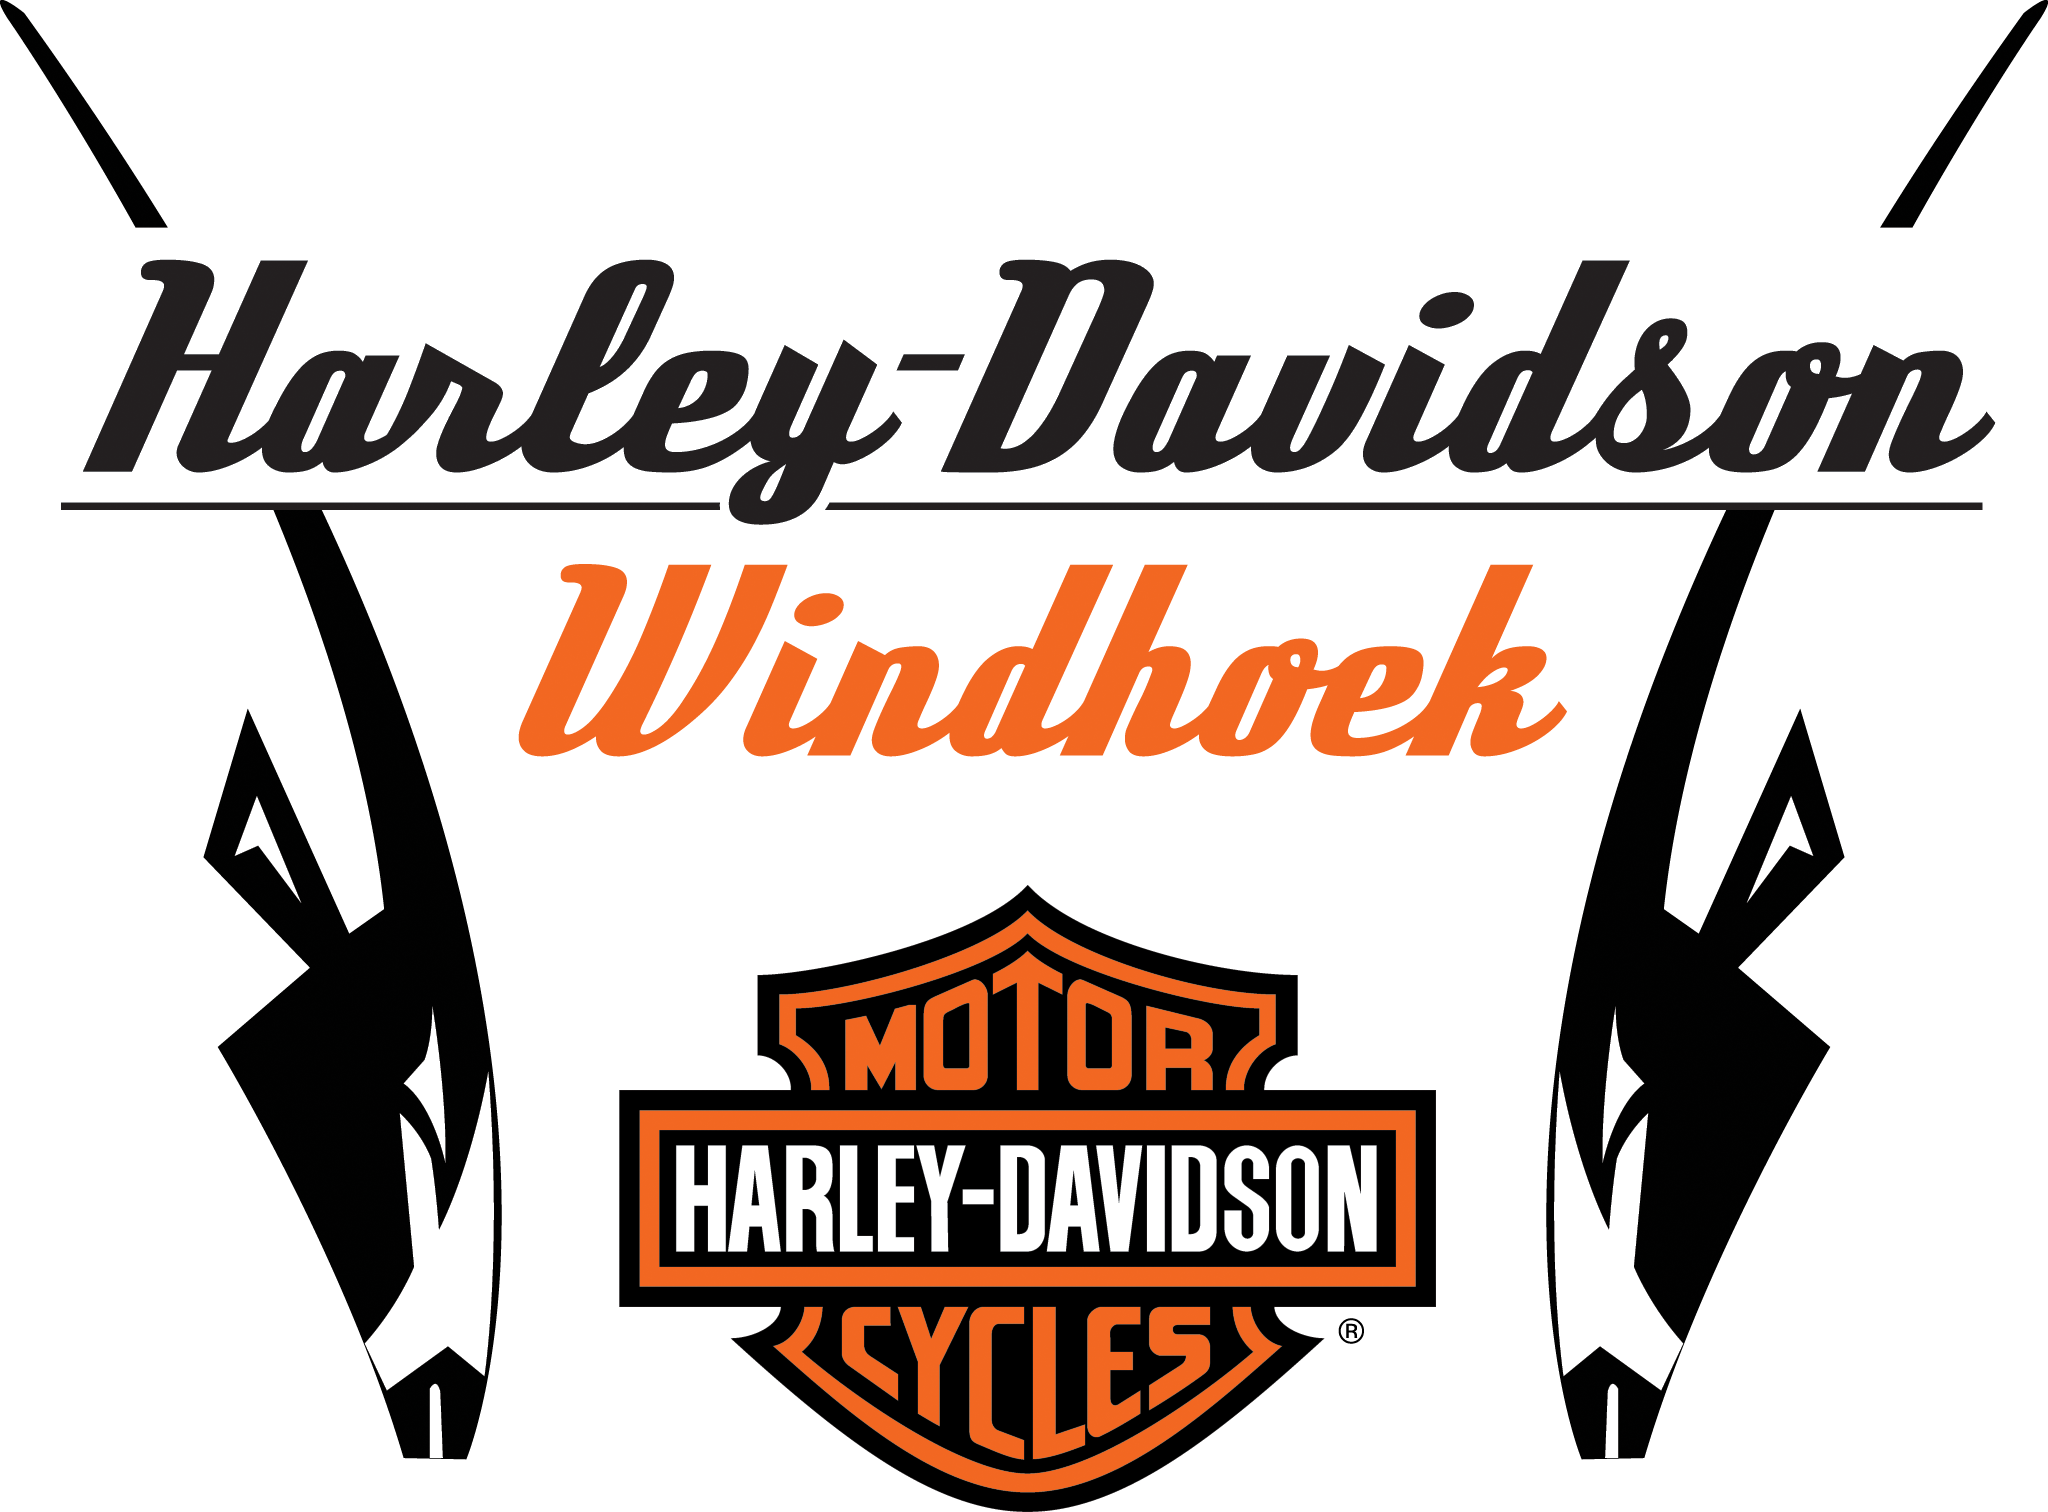 Harley-Davidson<sup>&reg;</sup> Windhoek